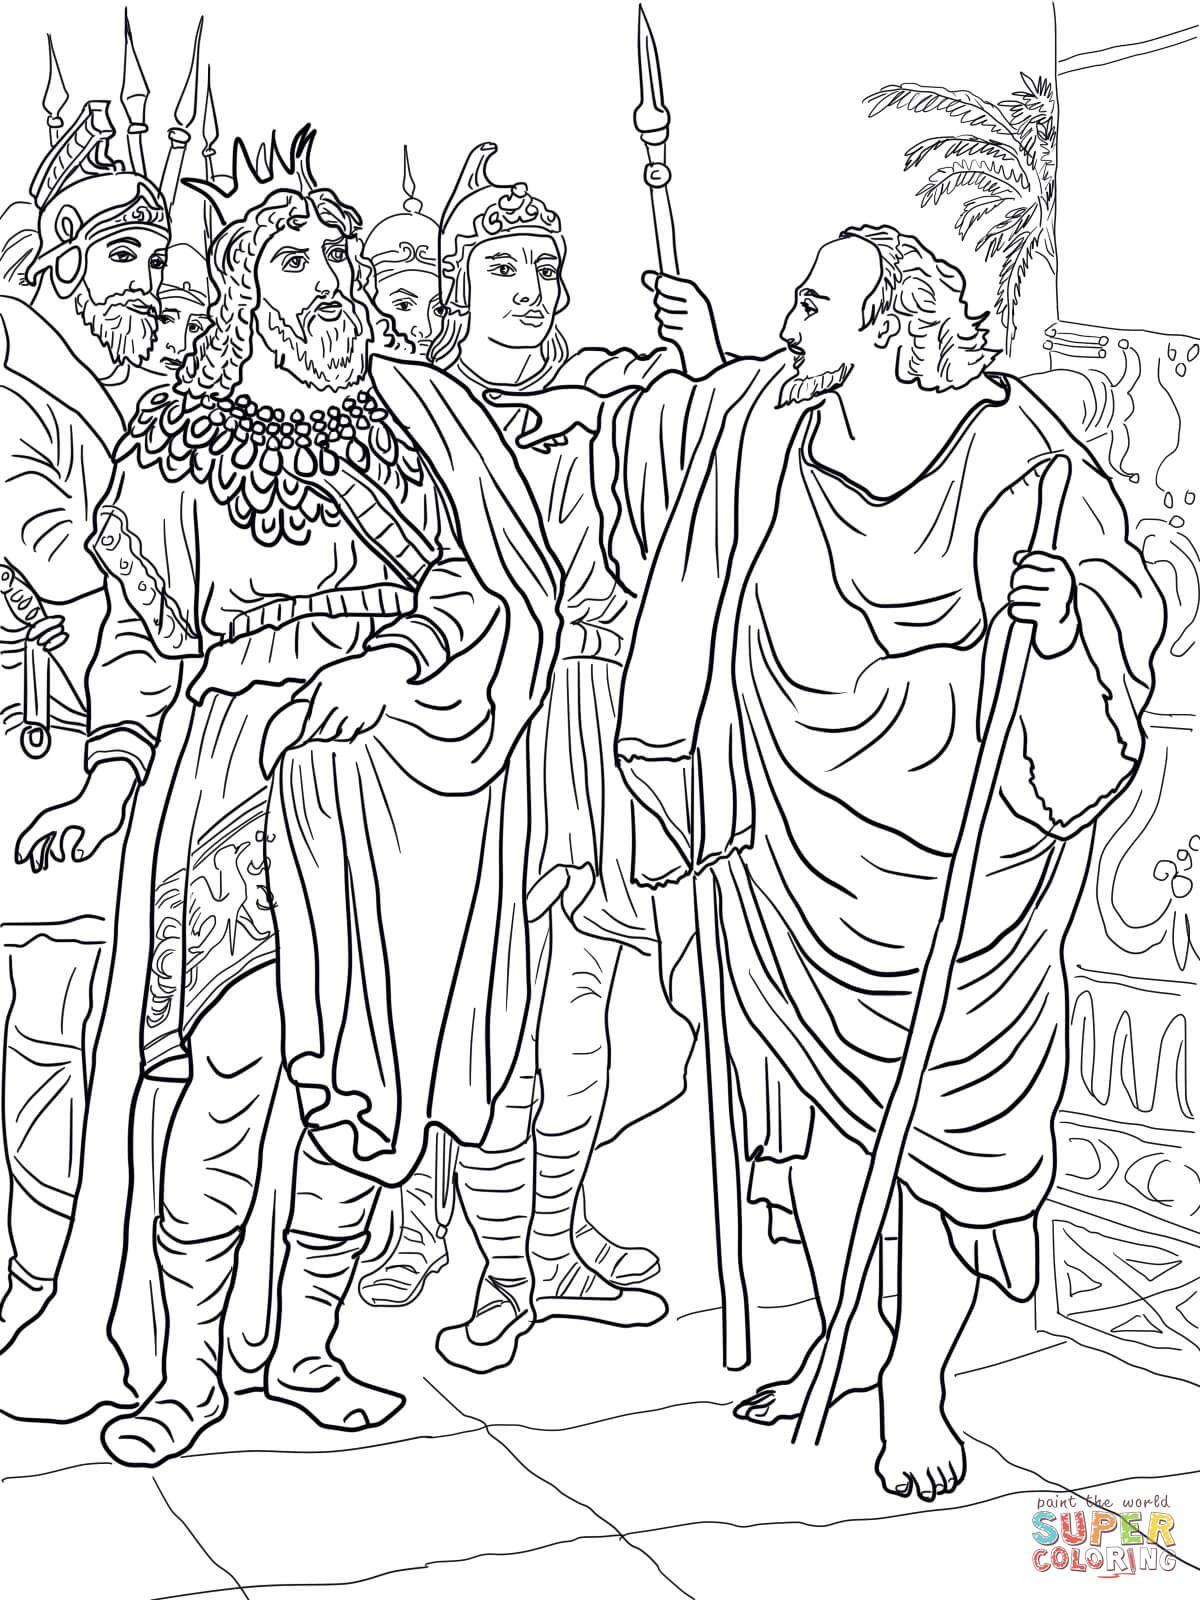 Elijah and King Ahab | Super Coloring | В/Ш 4 Илия | Pinterest ...